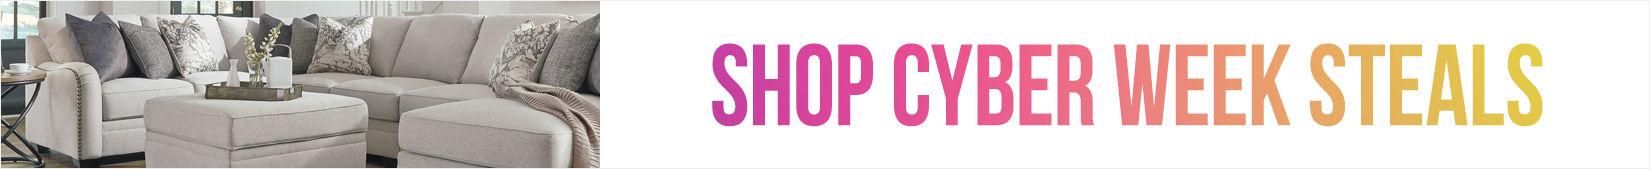 Shop Cyber Week Steals